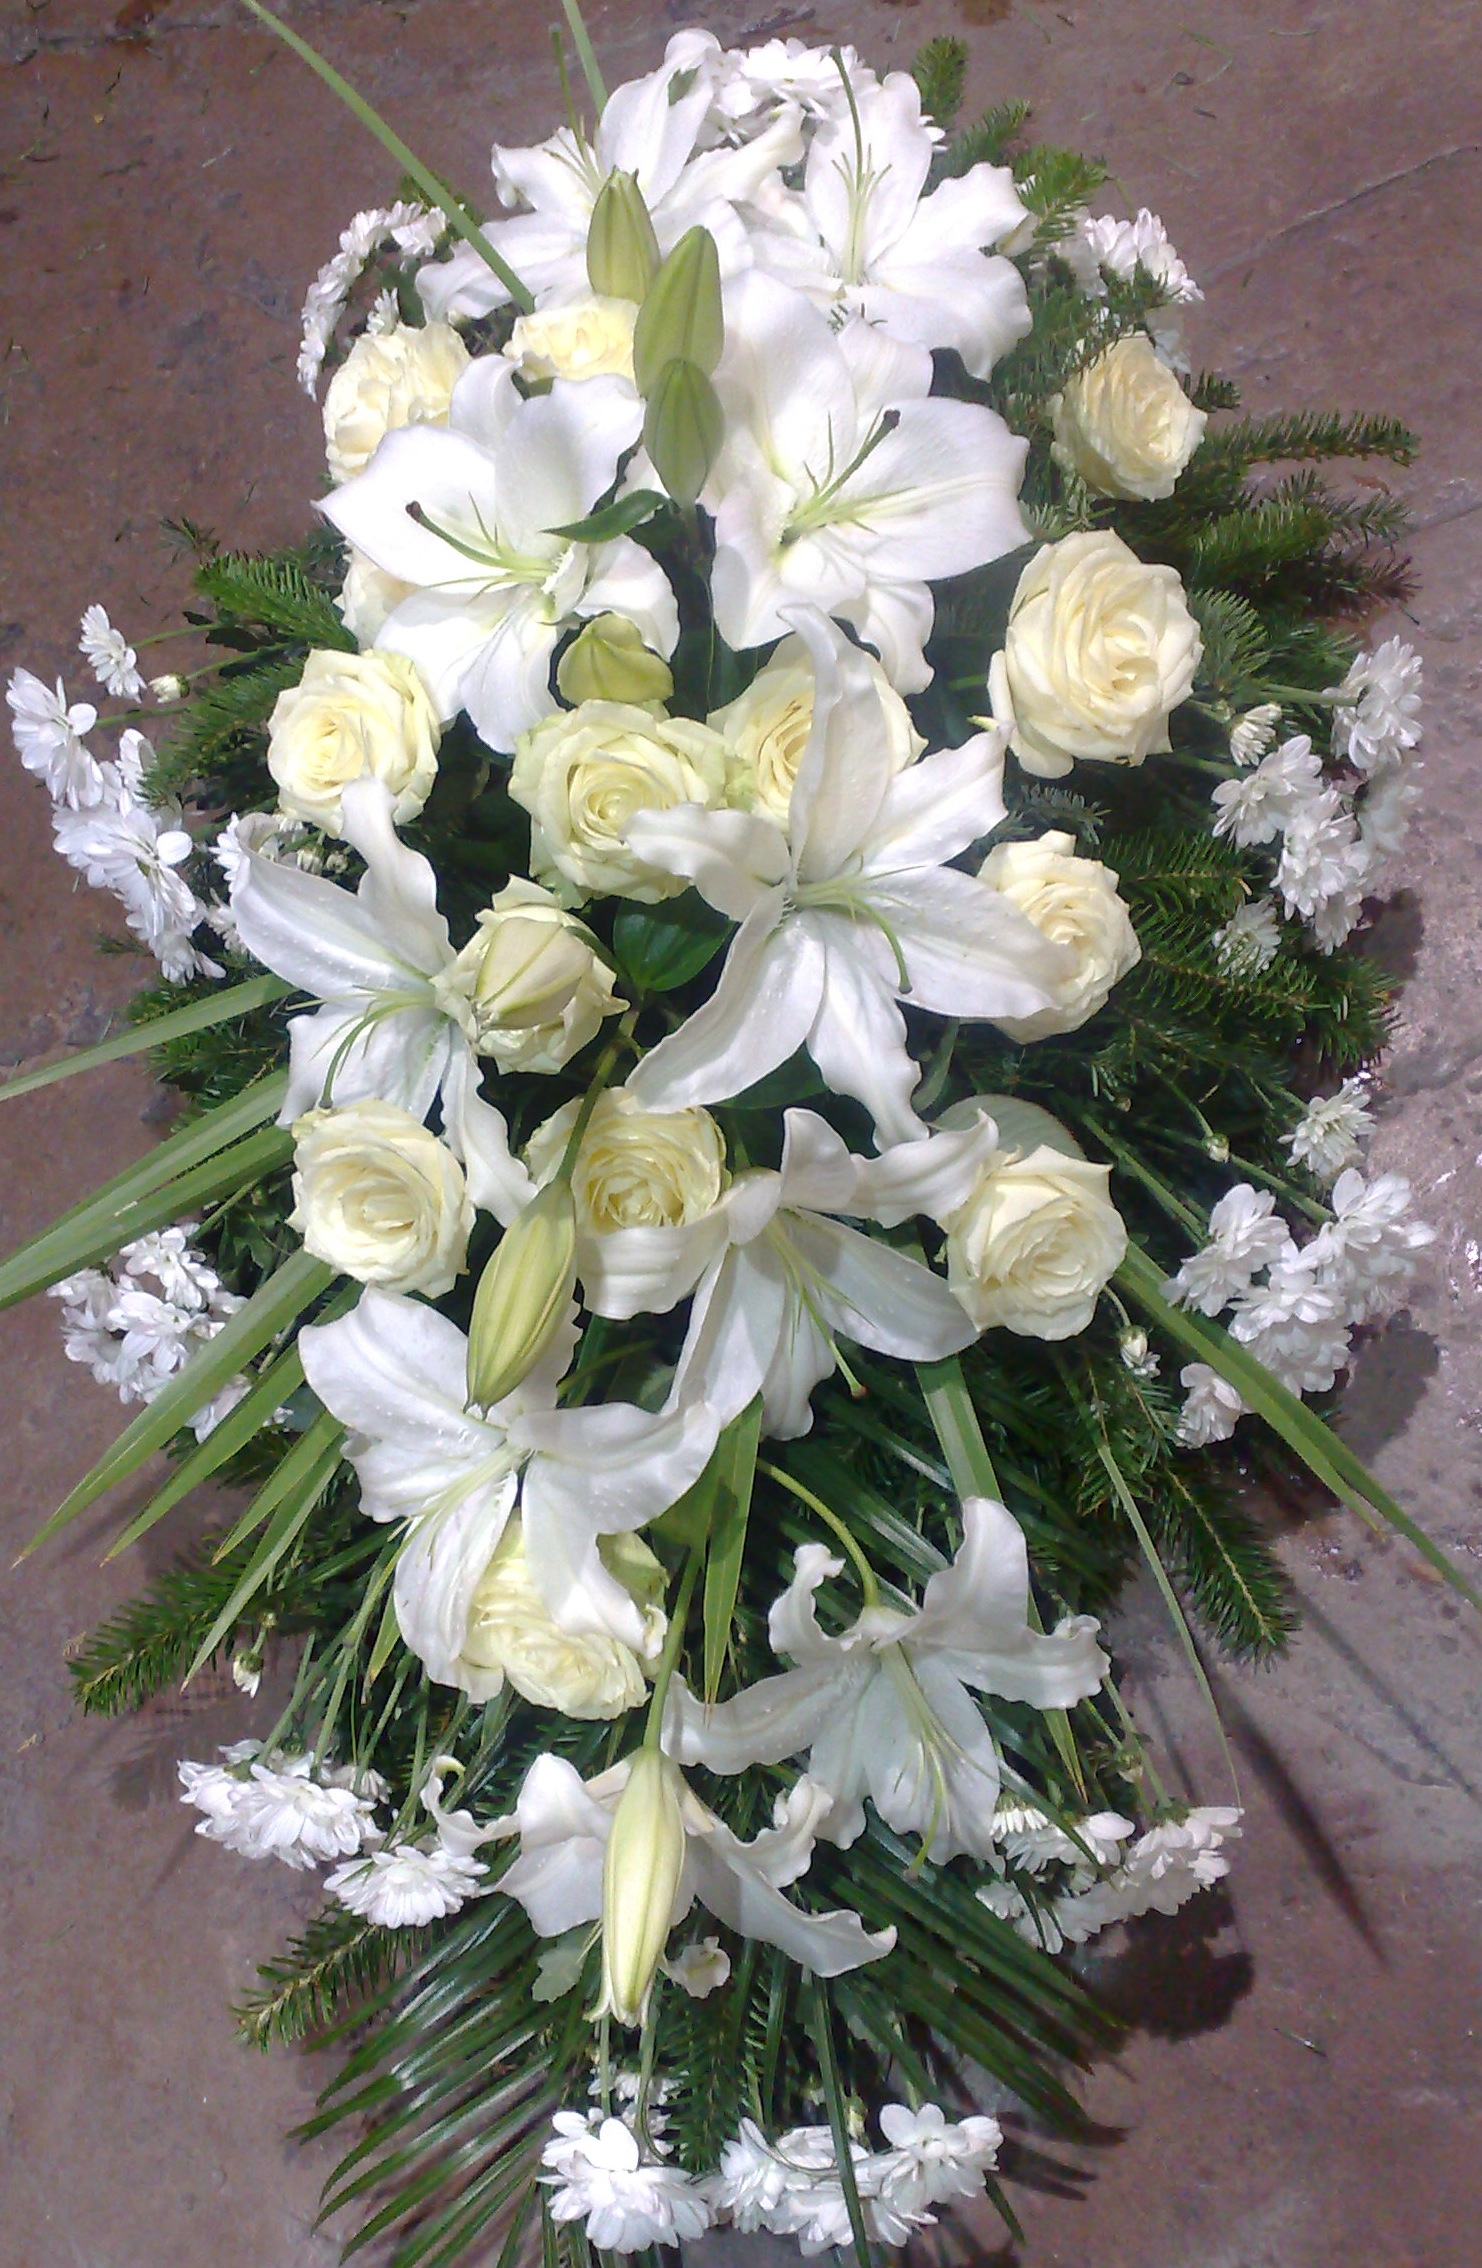 Suza ljiljani, ruže i hrizanteme